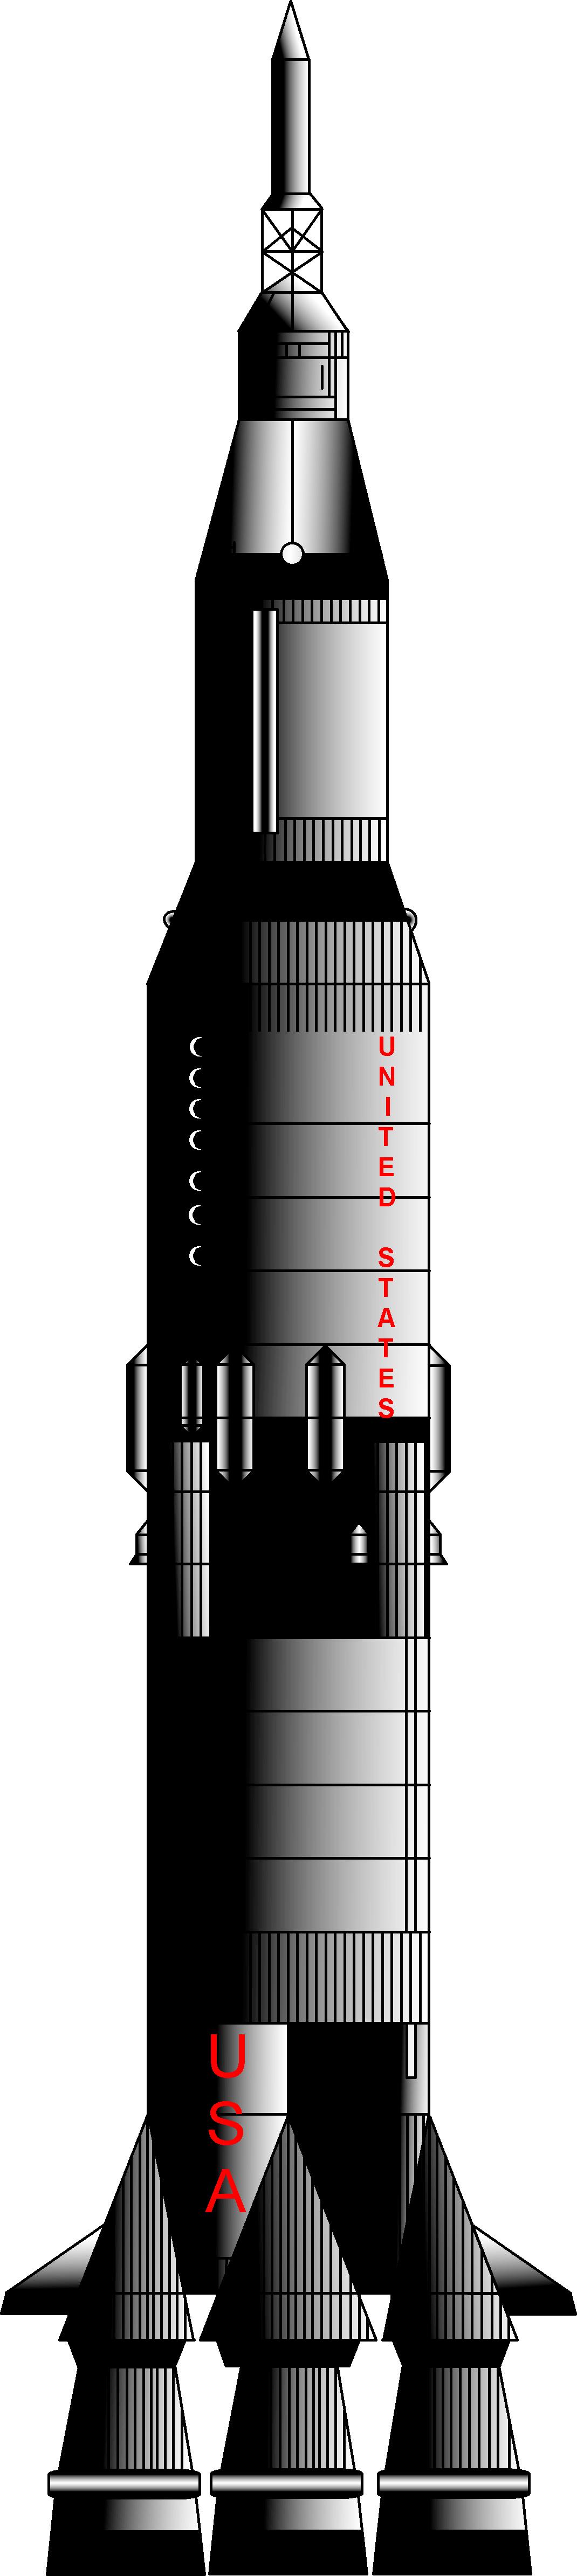 apollo rocket drawing - photo #44